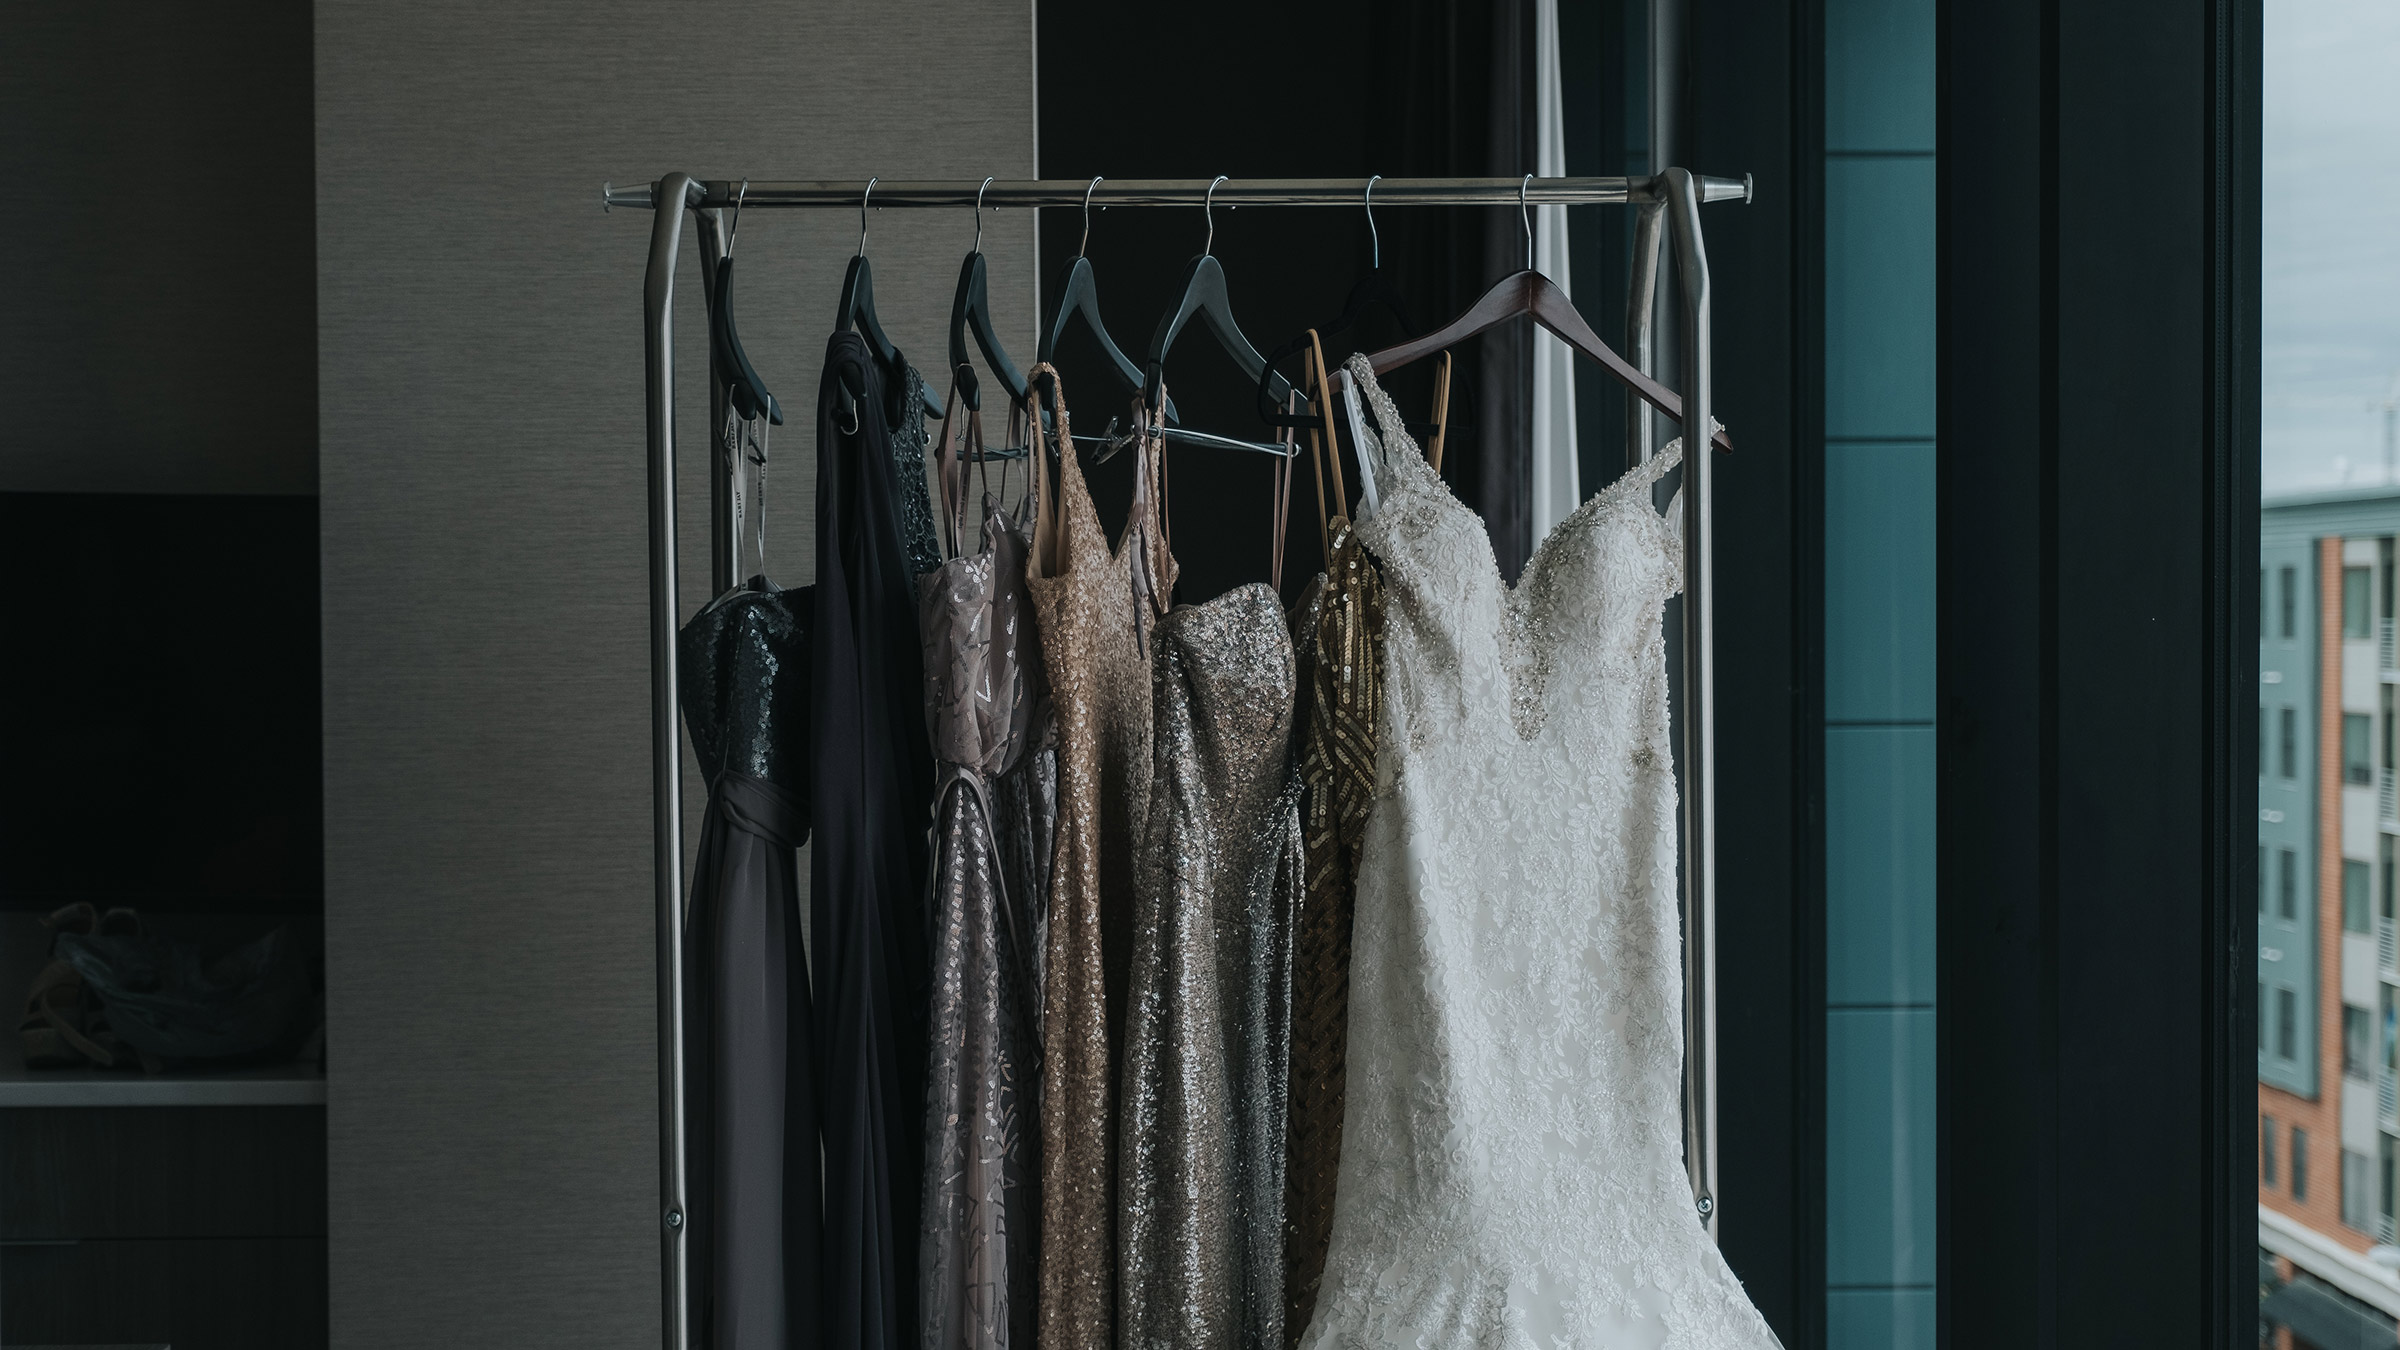 detail-shot-od-wedding-dress-and-bridesmaids-dresses-desmoines-iowa-ac-hotel-raelyn-ramey-photography.jpg